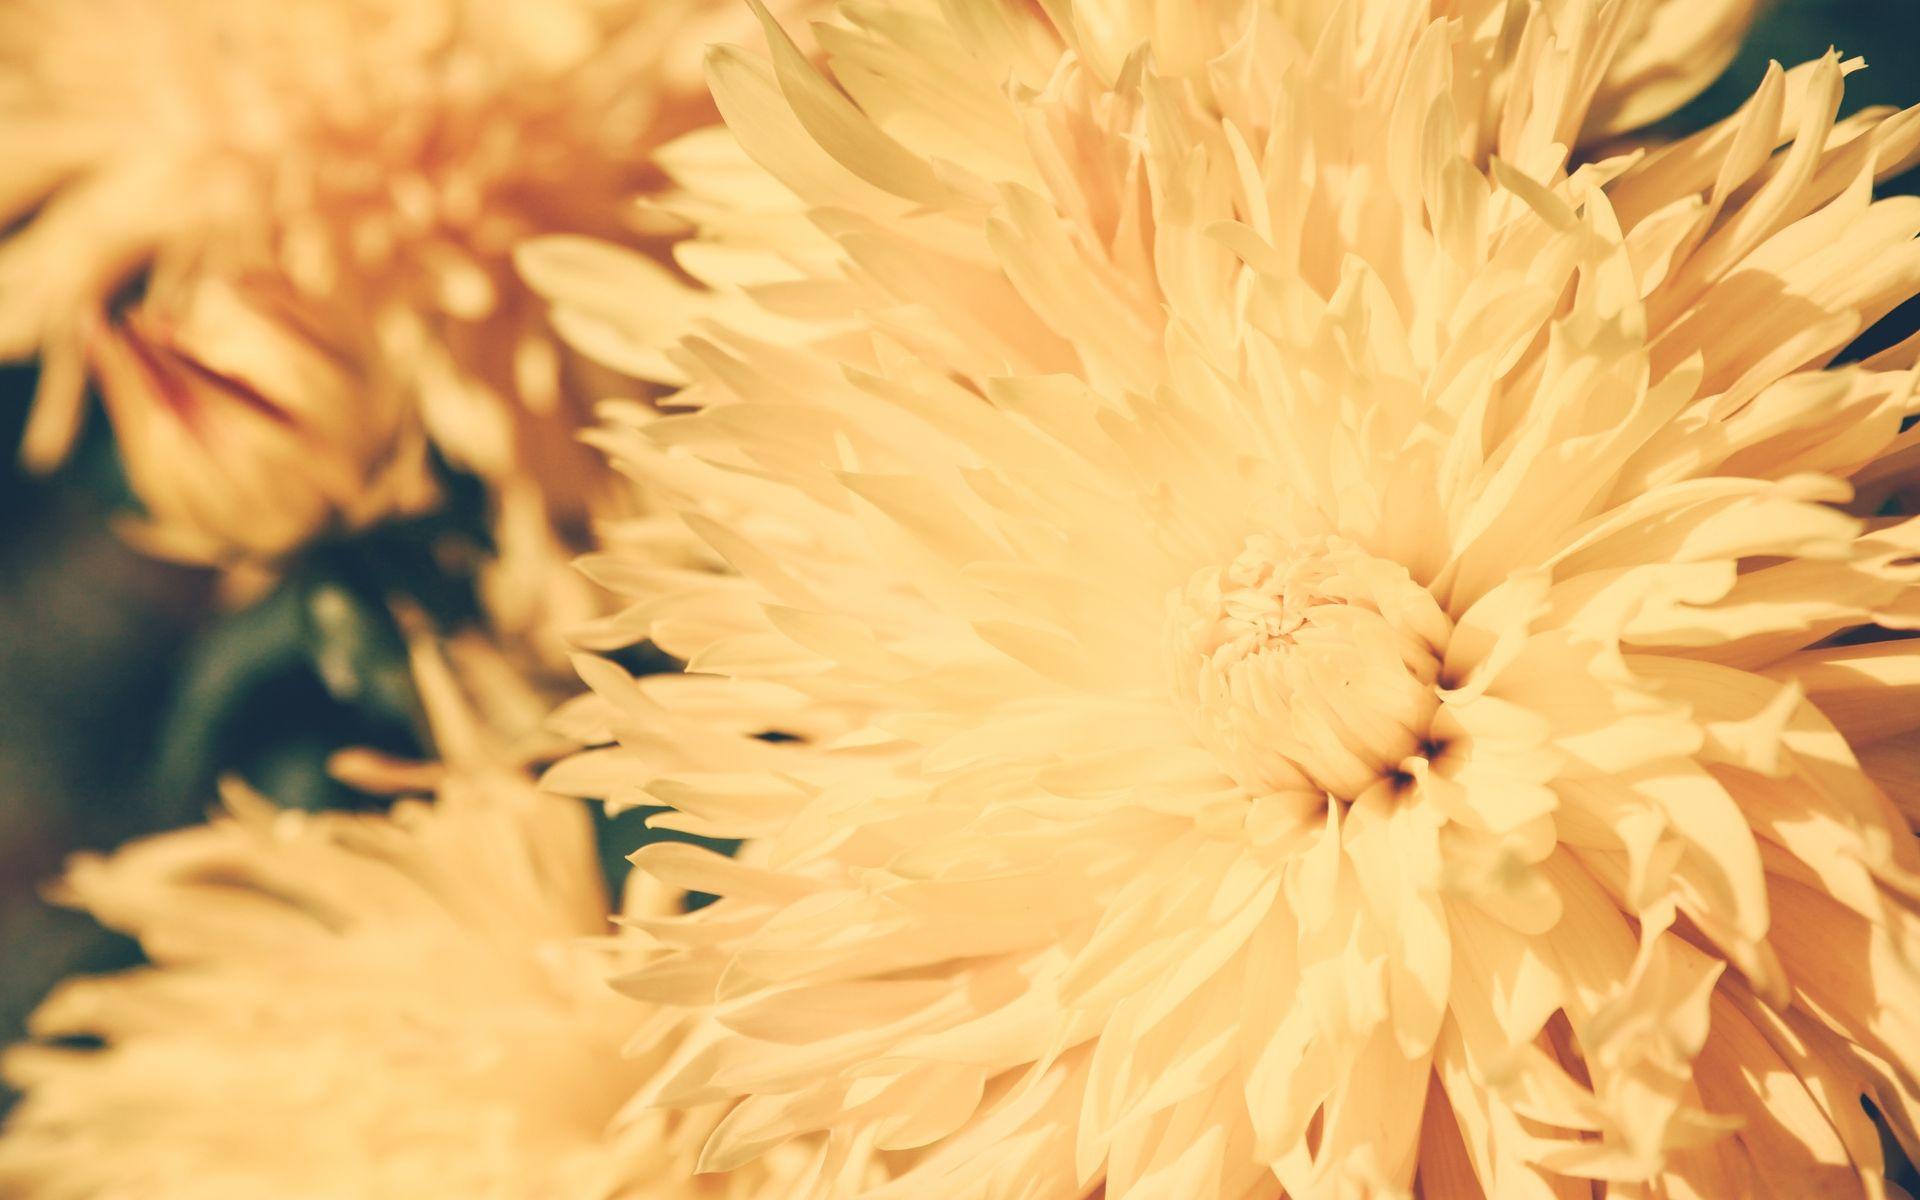 Chrysanthemum Flower Images Hd Wallpaper Flower Images Chrysanthemum Flower Flower Images Hd